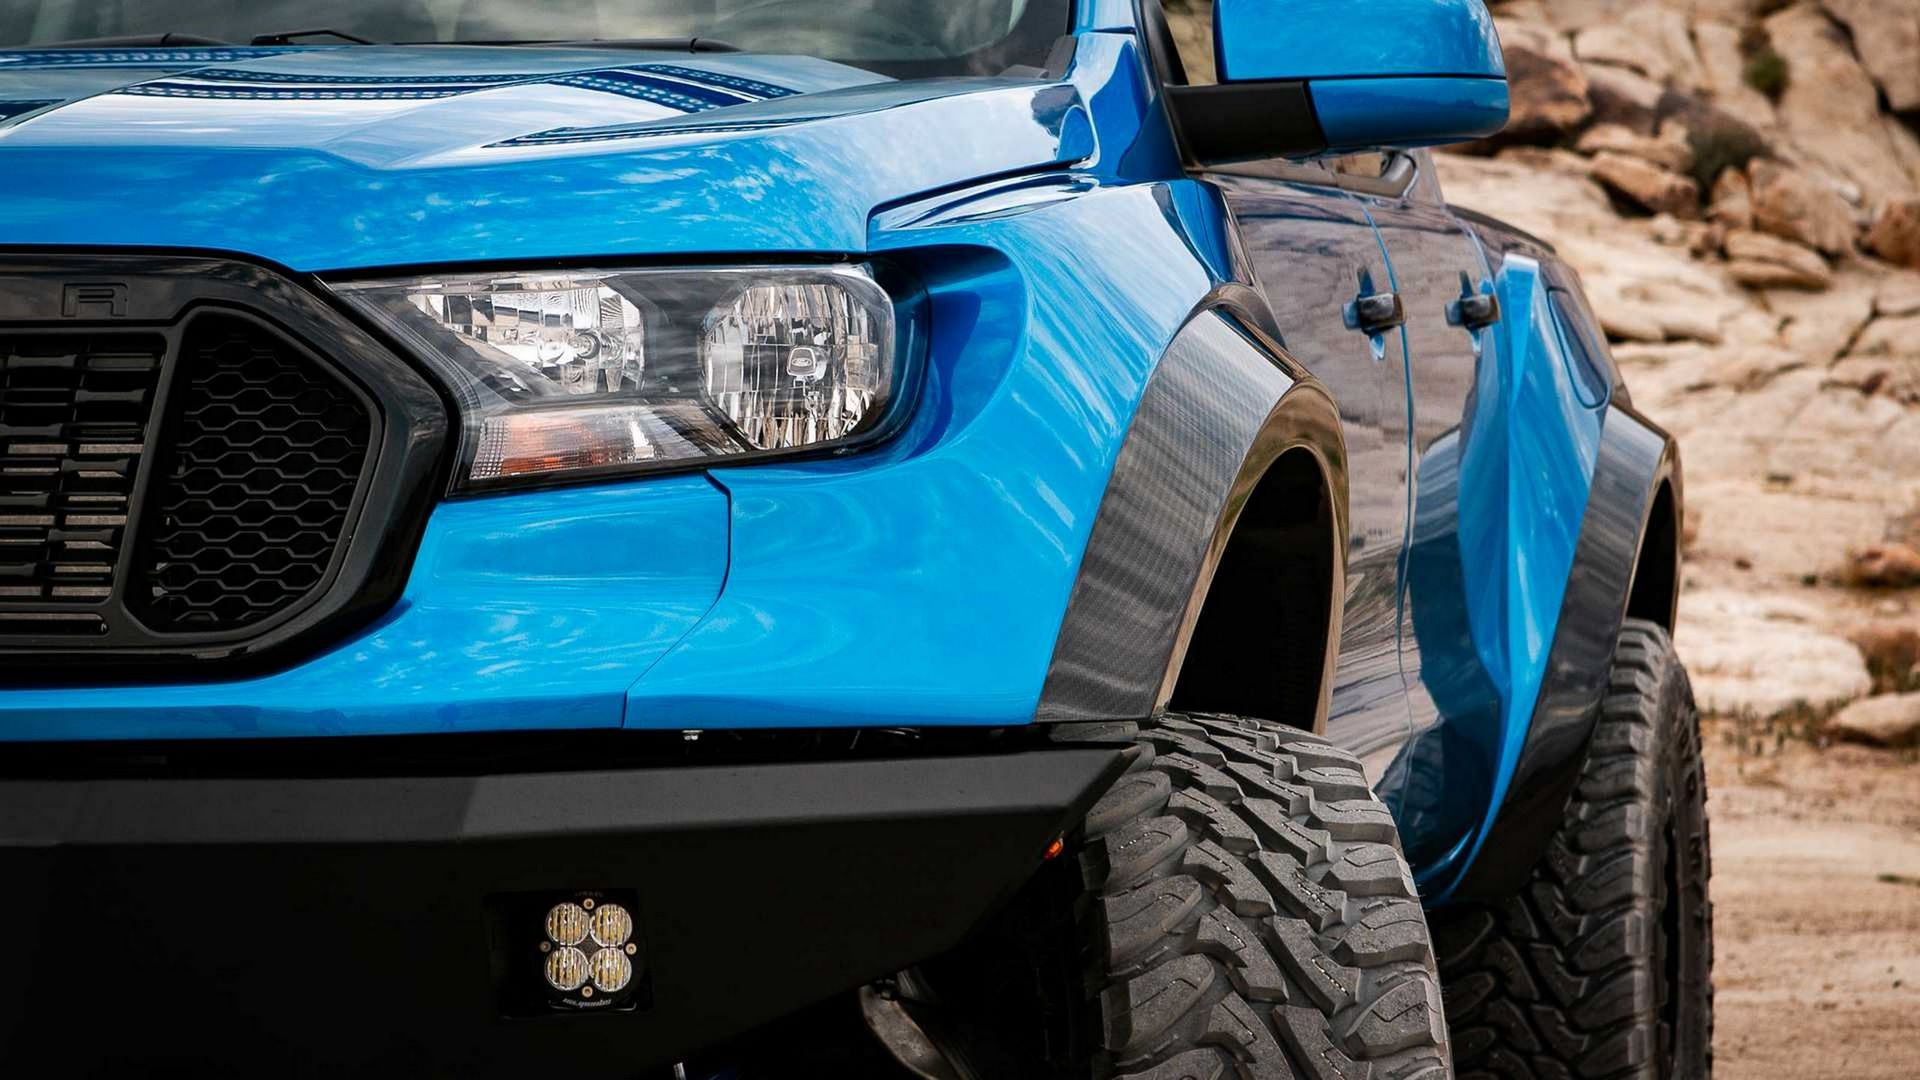 Ford-Ranger-Prorunner-By-APG-25